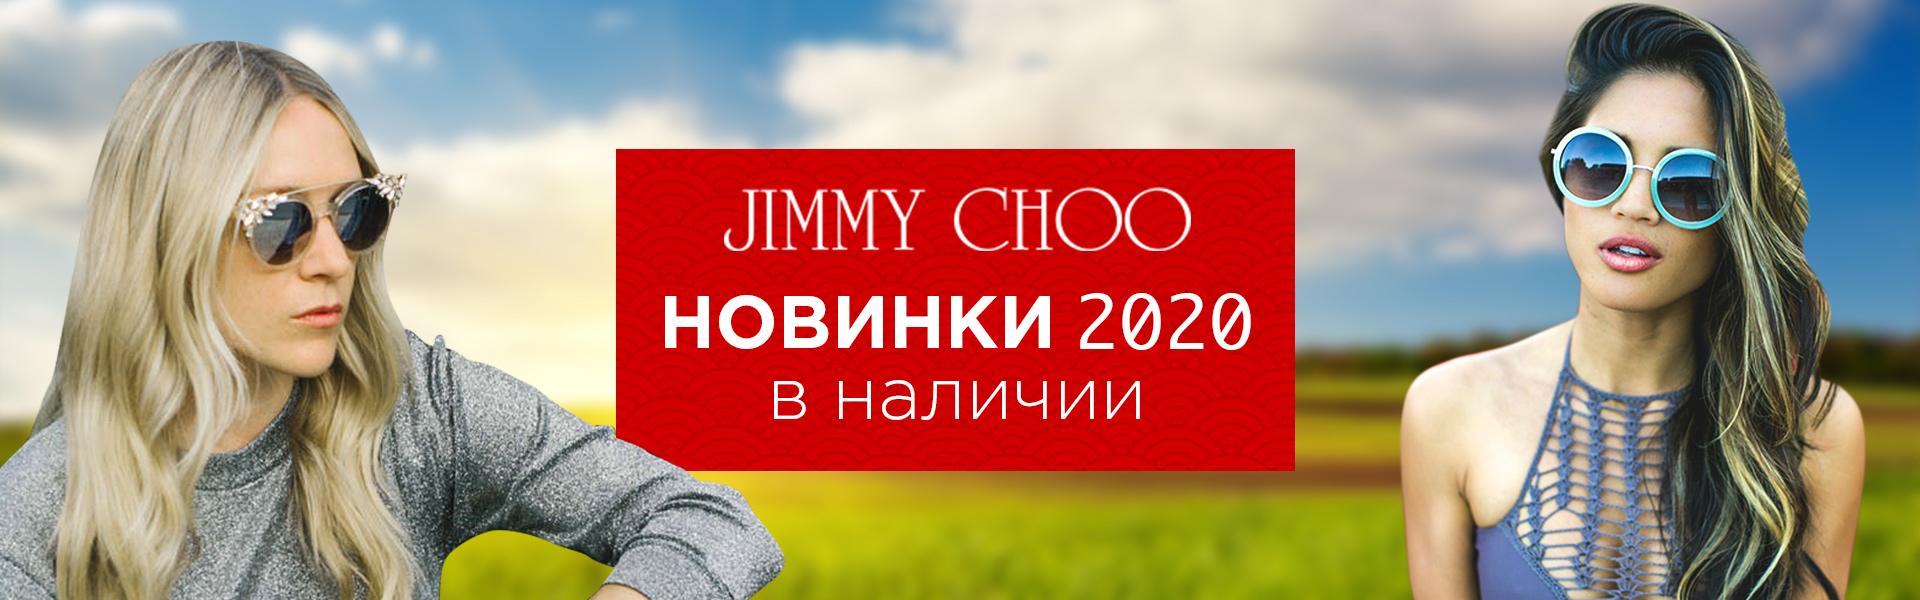 очки Джимми чу